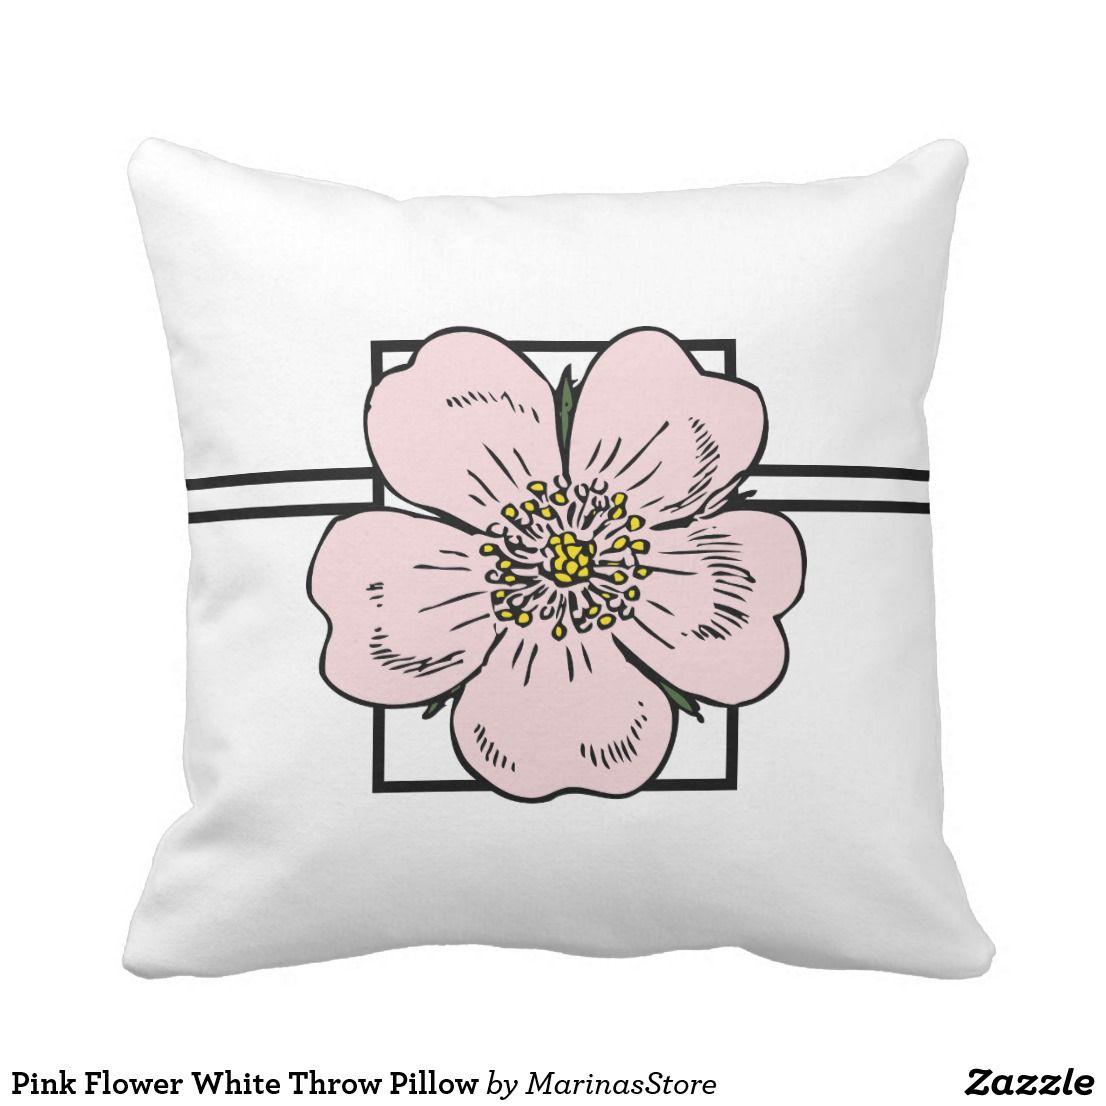 Pink Flower White Throw Pillow Homedecor Zazzle Pinkflowers Throwpillows Pillows Floral Home Comfort Blue Throw Pillows Throw Pillows Pillows